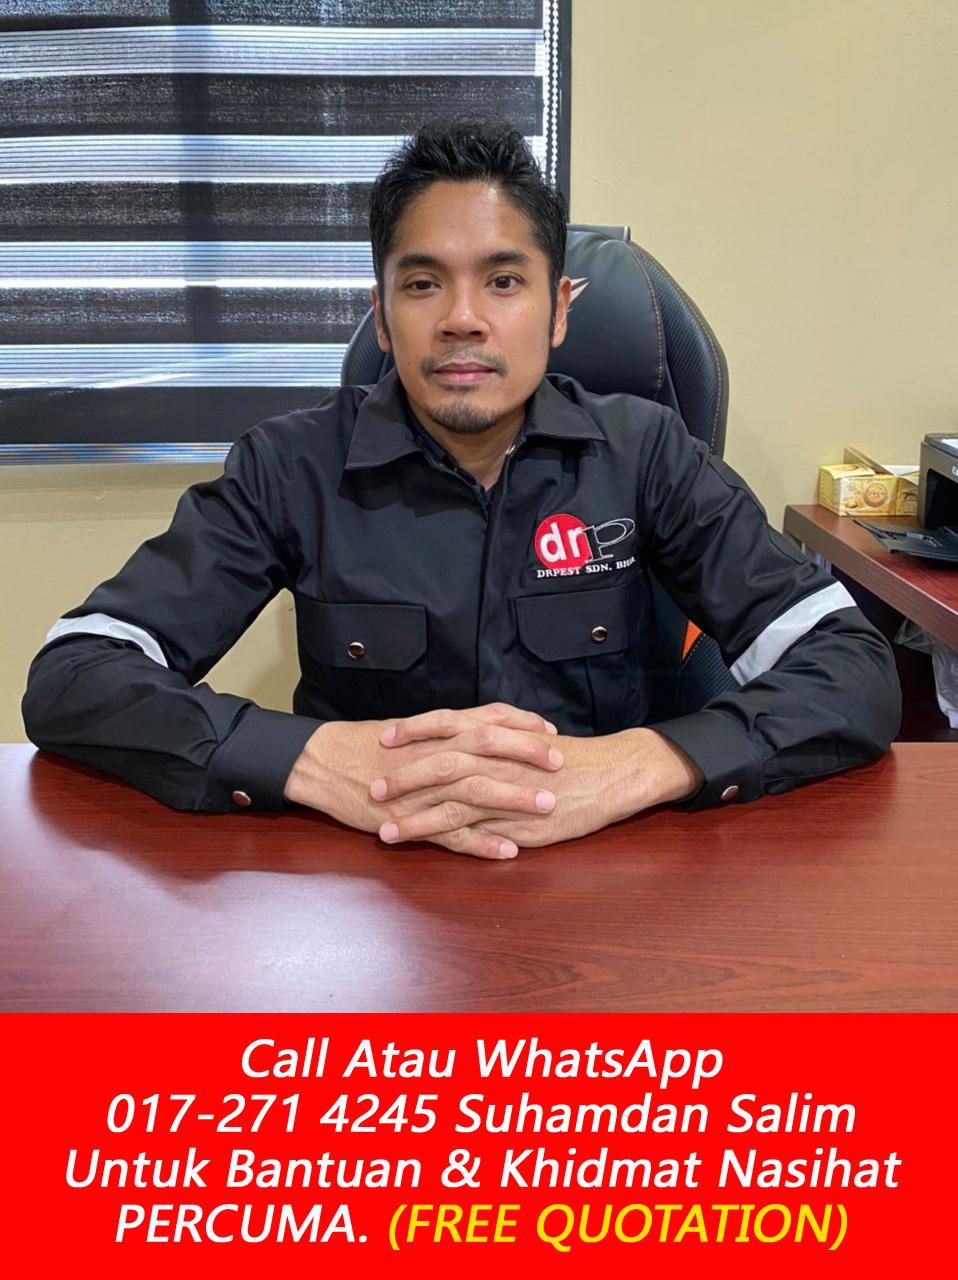 drpest sdn bhd drp maintenance and services syarikat kawalan serangga bumiputra yang berlesen the best company pest control near me area Kampung Pandan kl near me